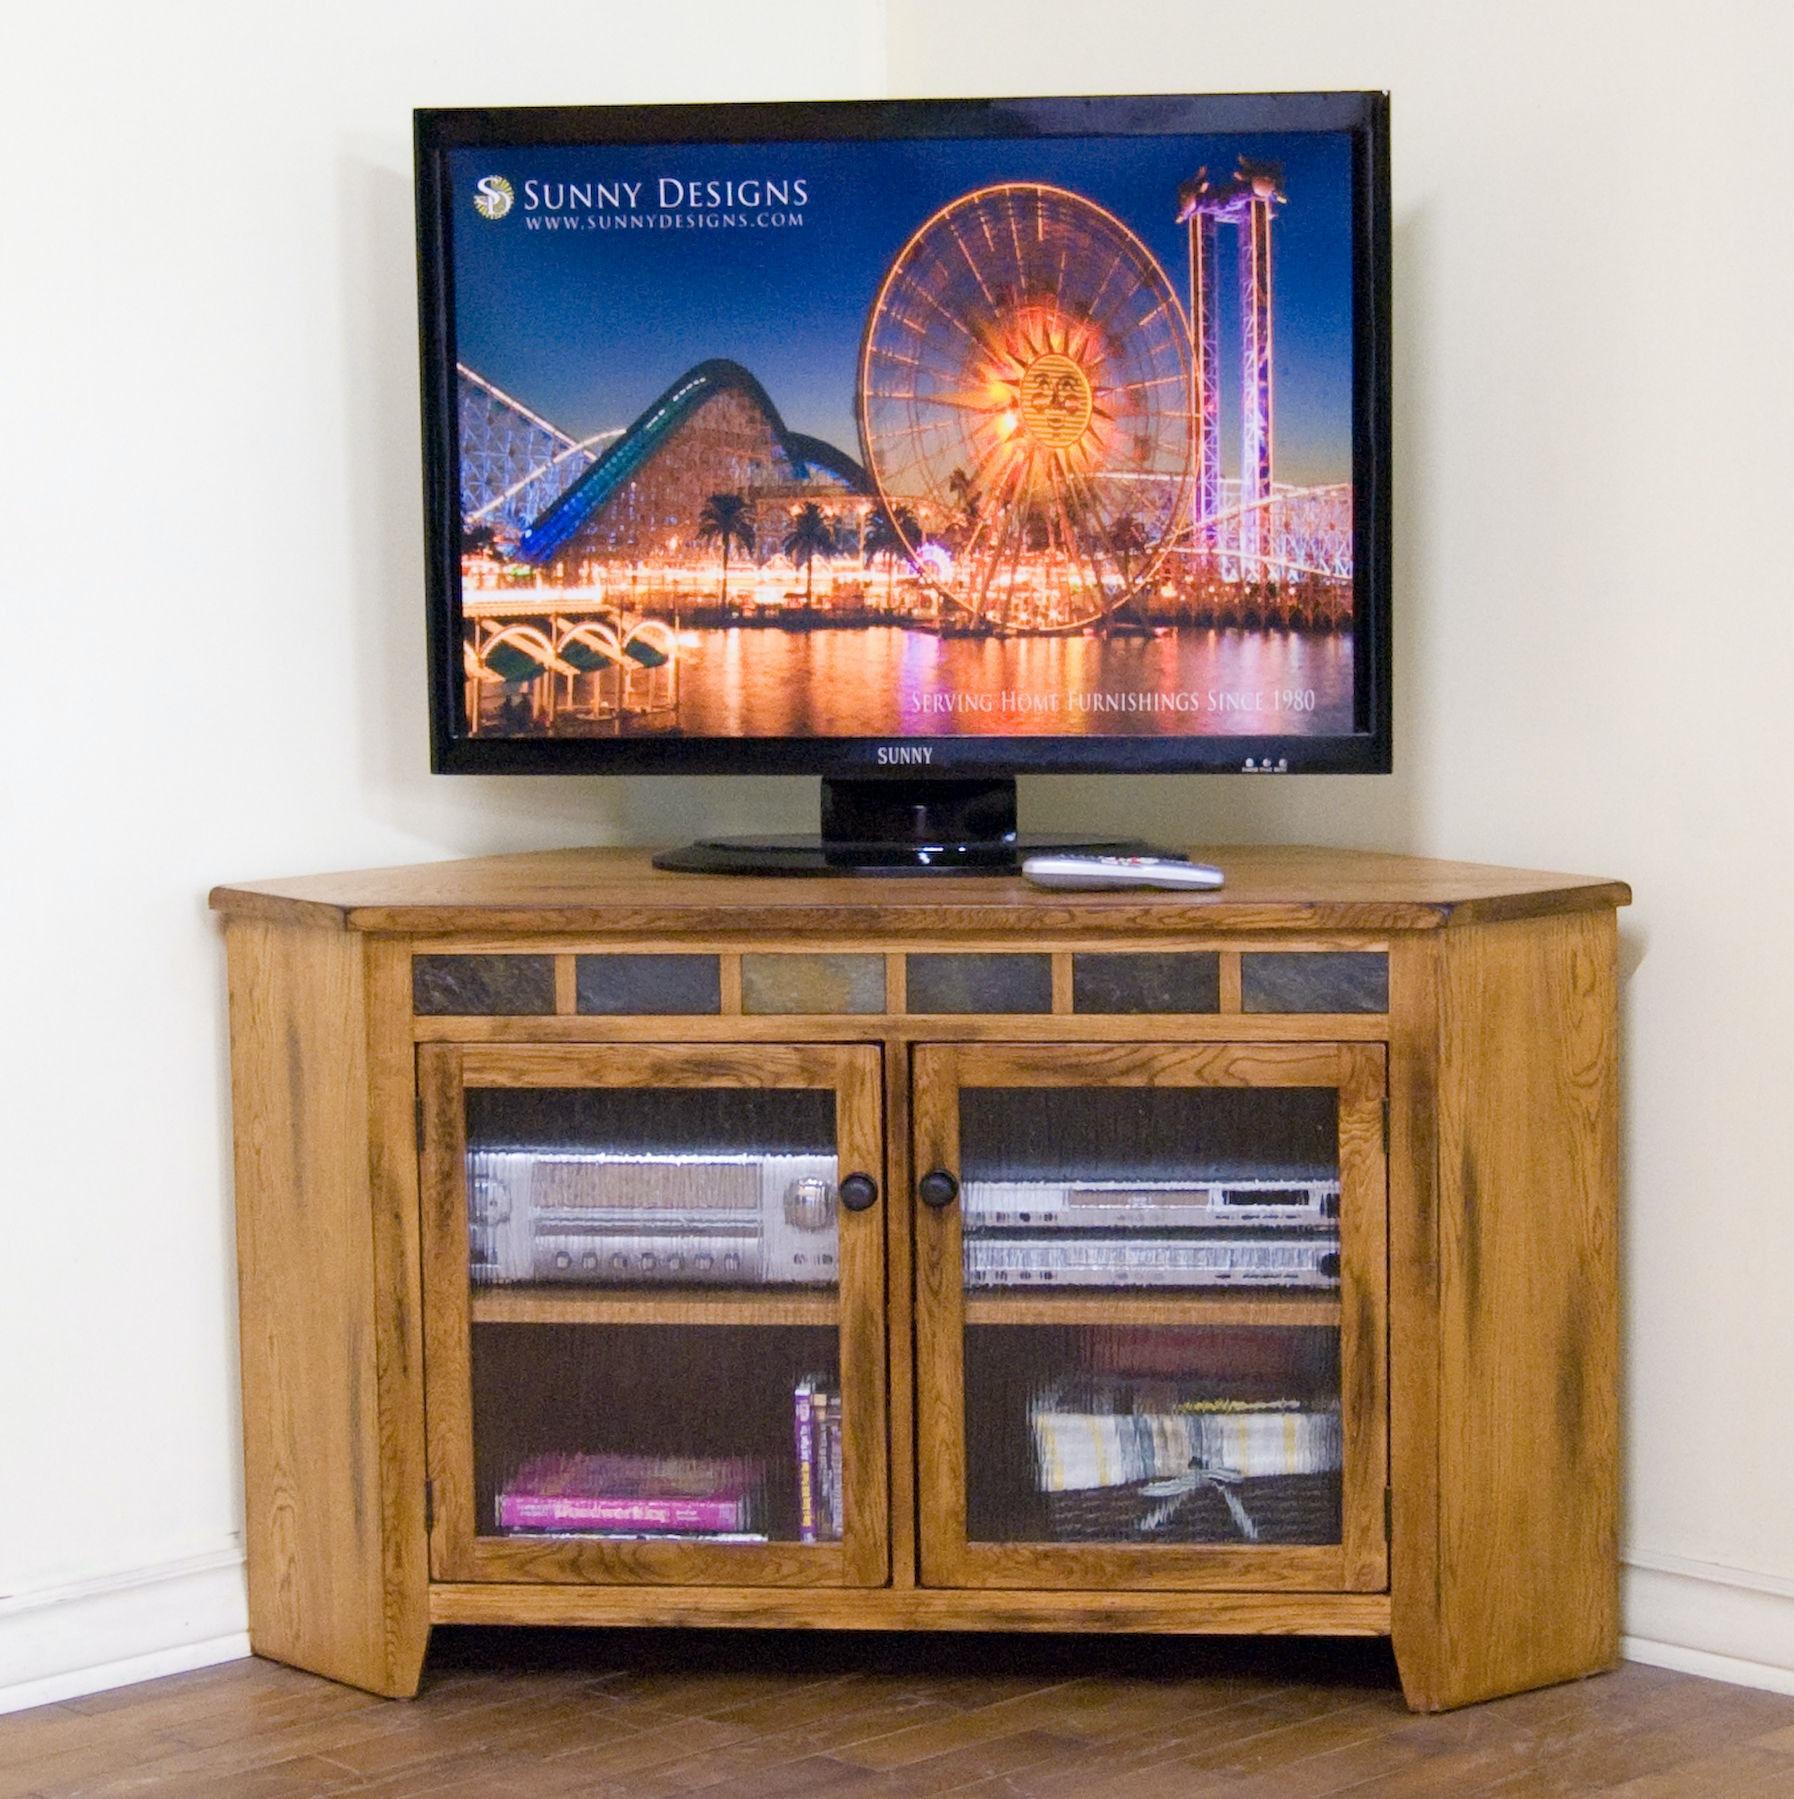 Sunny Designs Home Entertainment Sedona Corner Tv Console